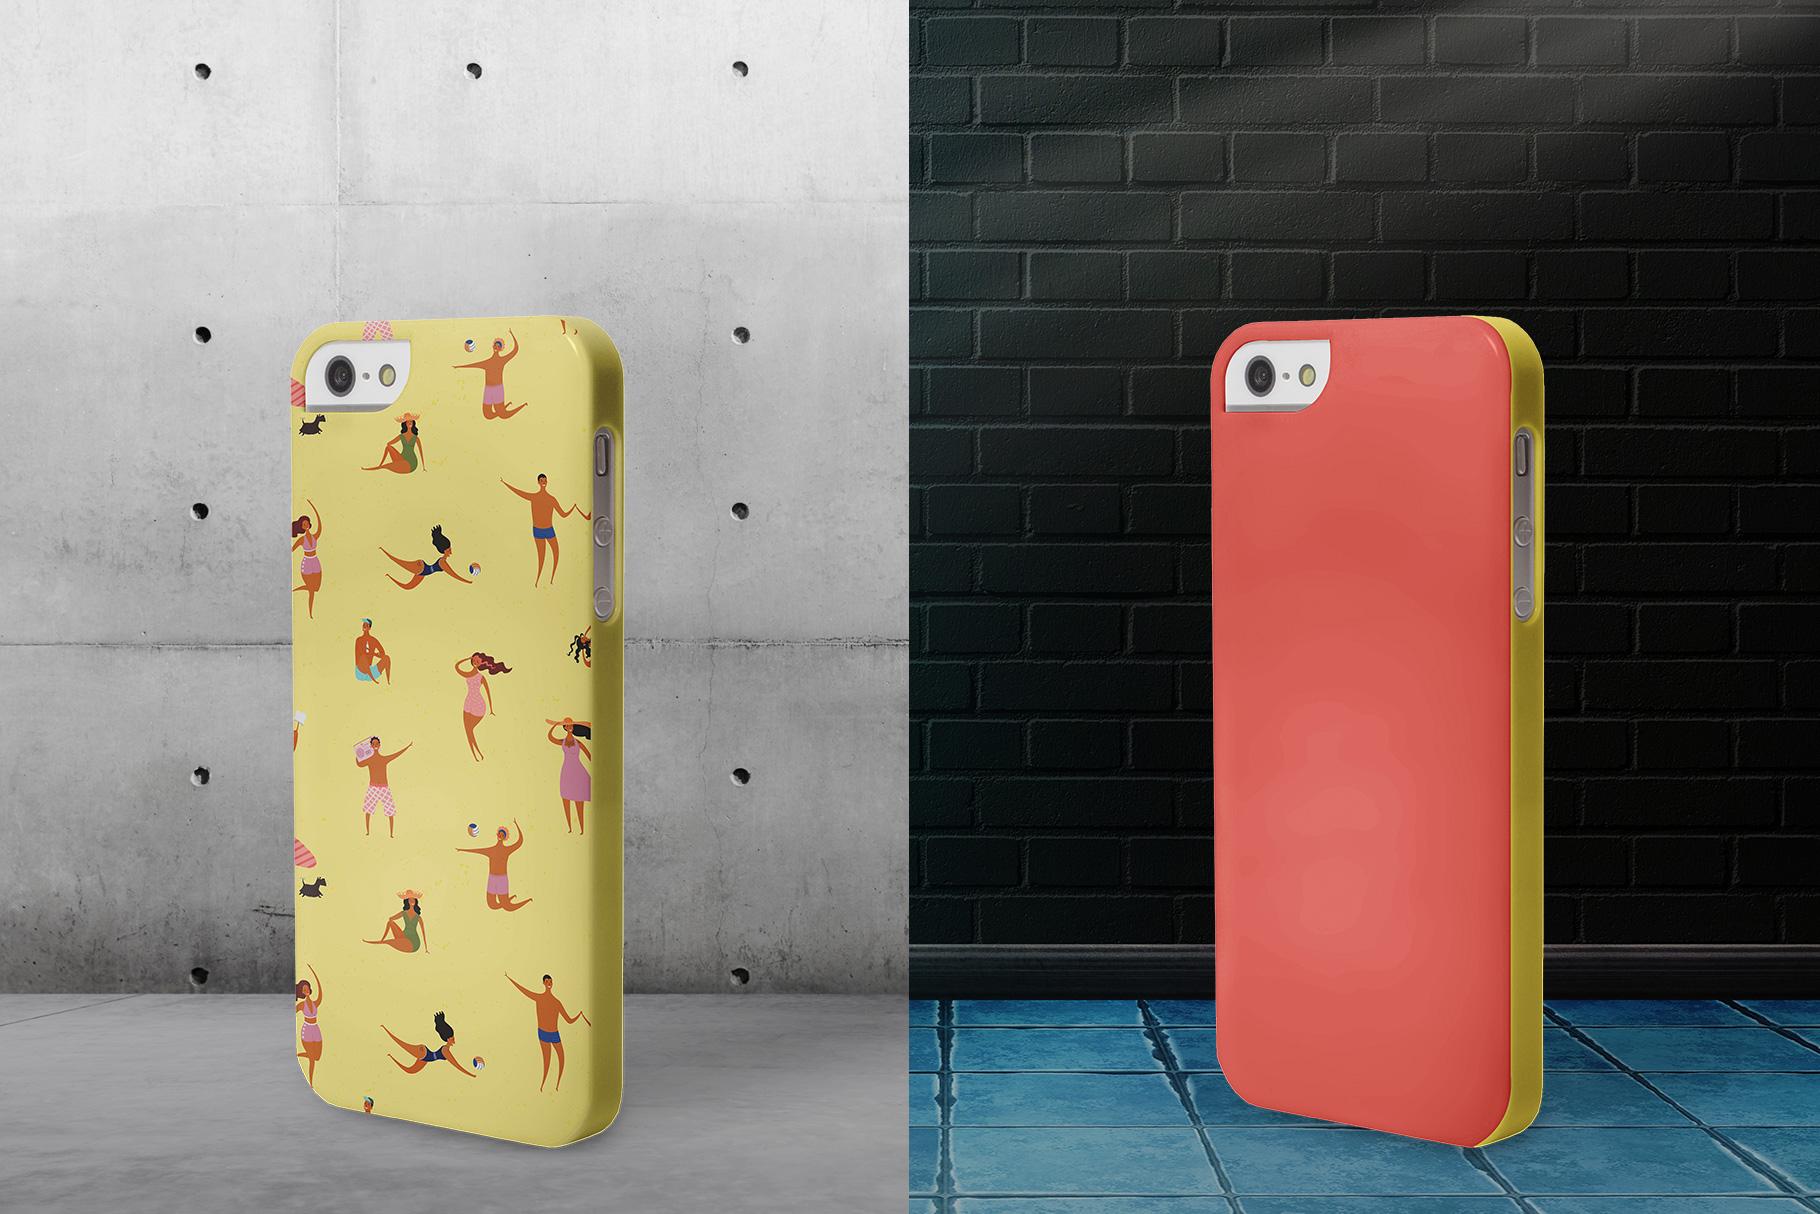 background options of the iphone snap backcase mockup